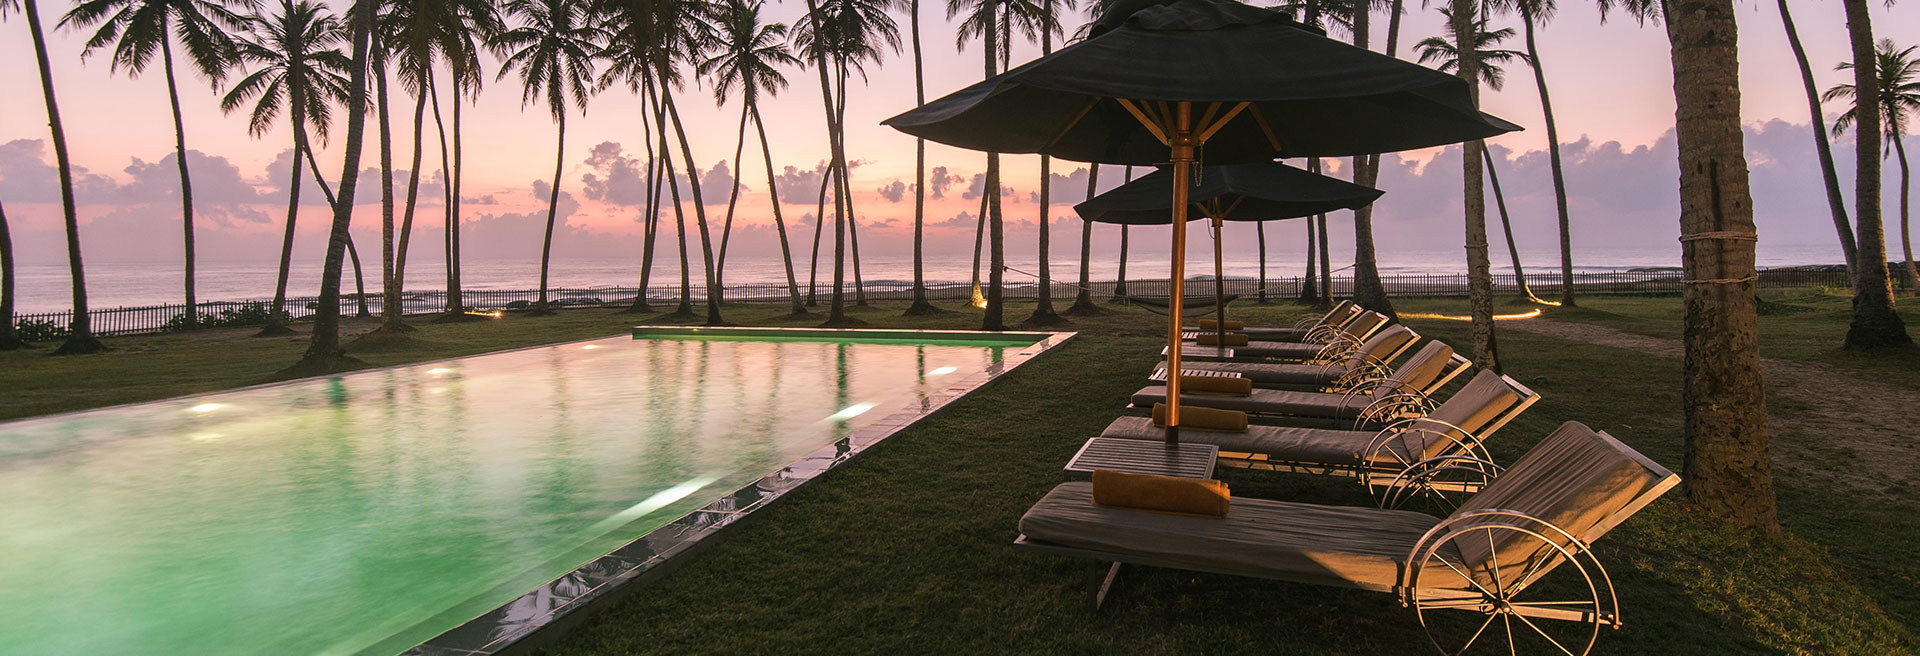 Jetwing Hotels Sri Lanka Villas